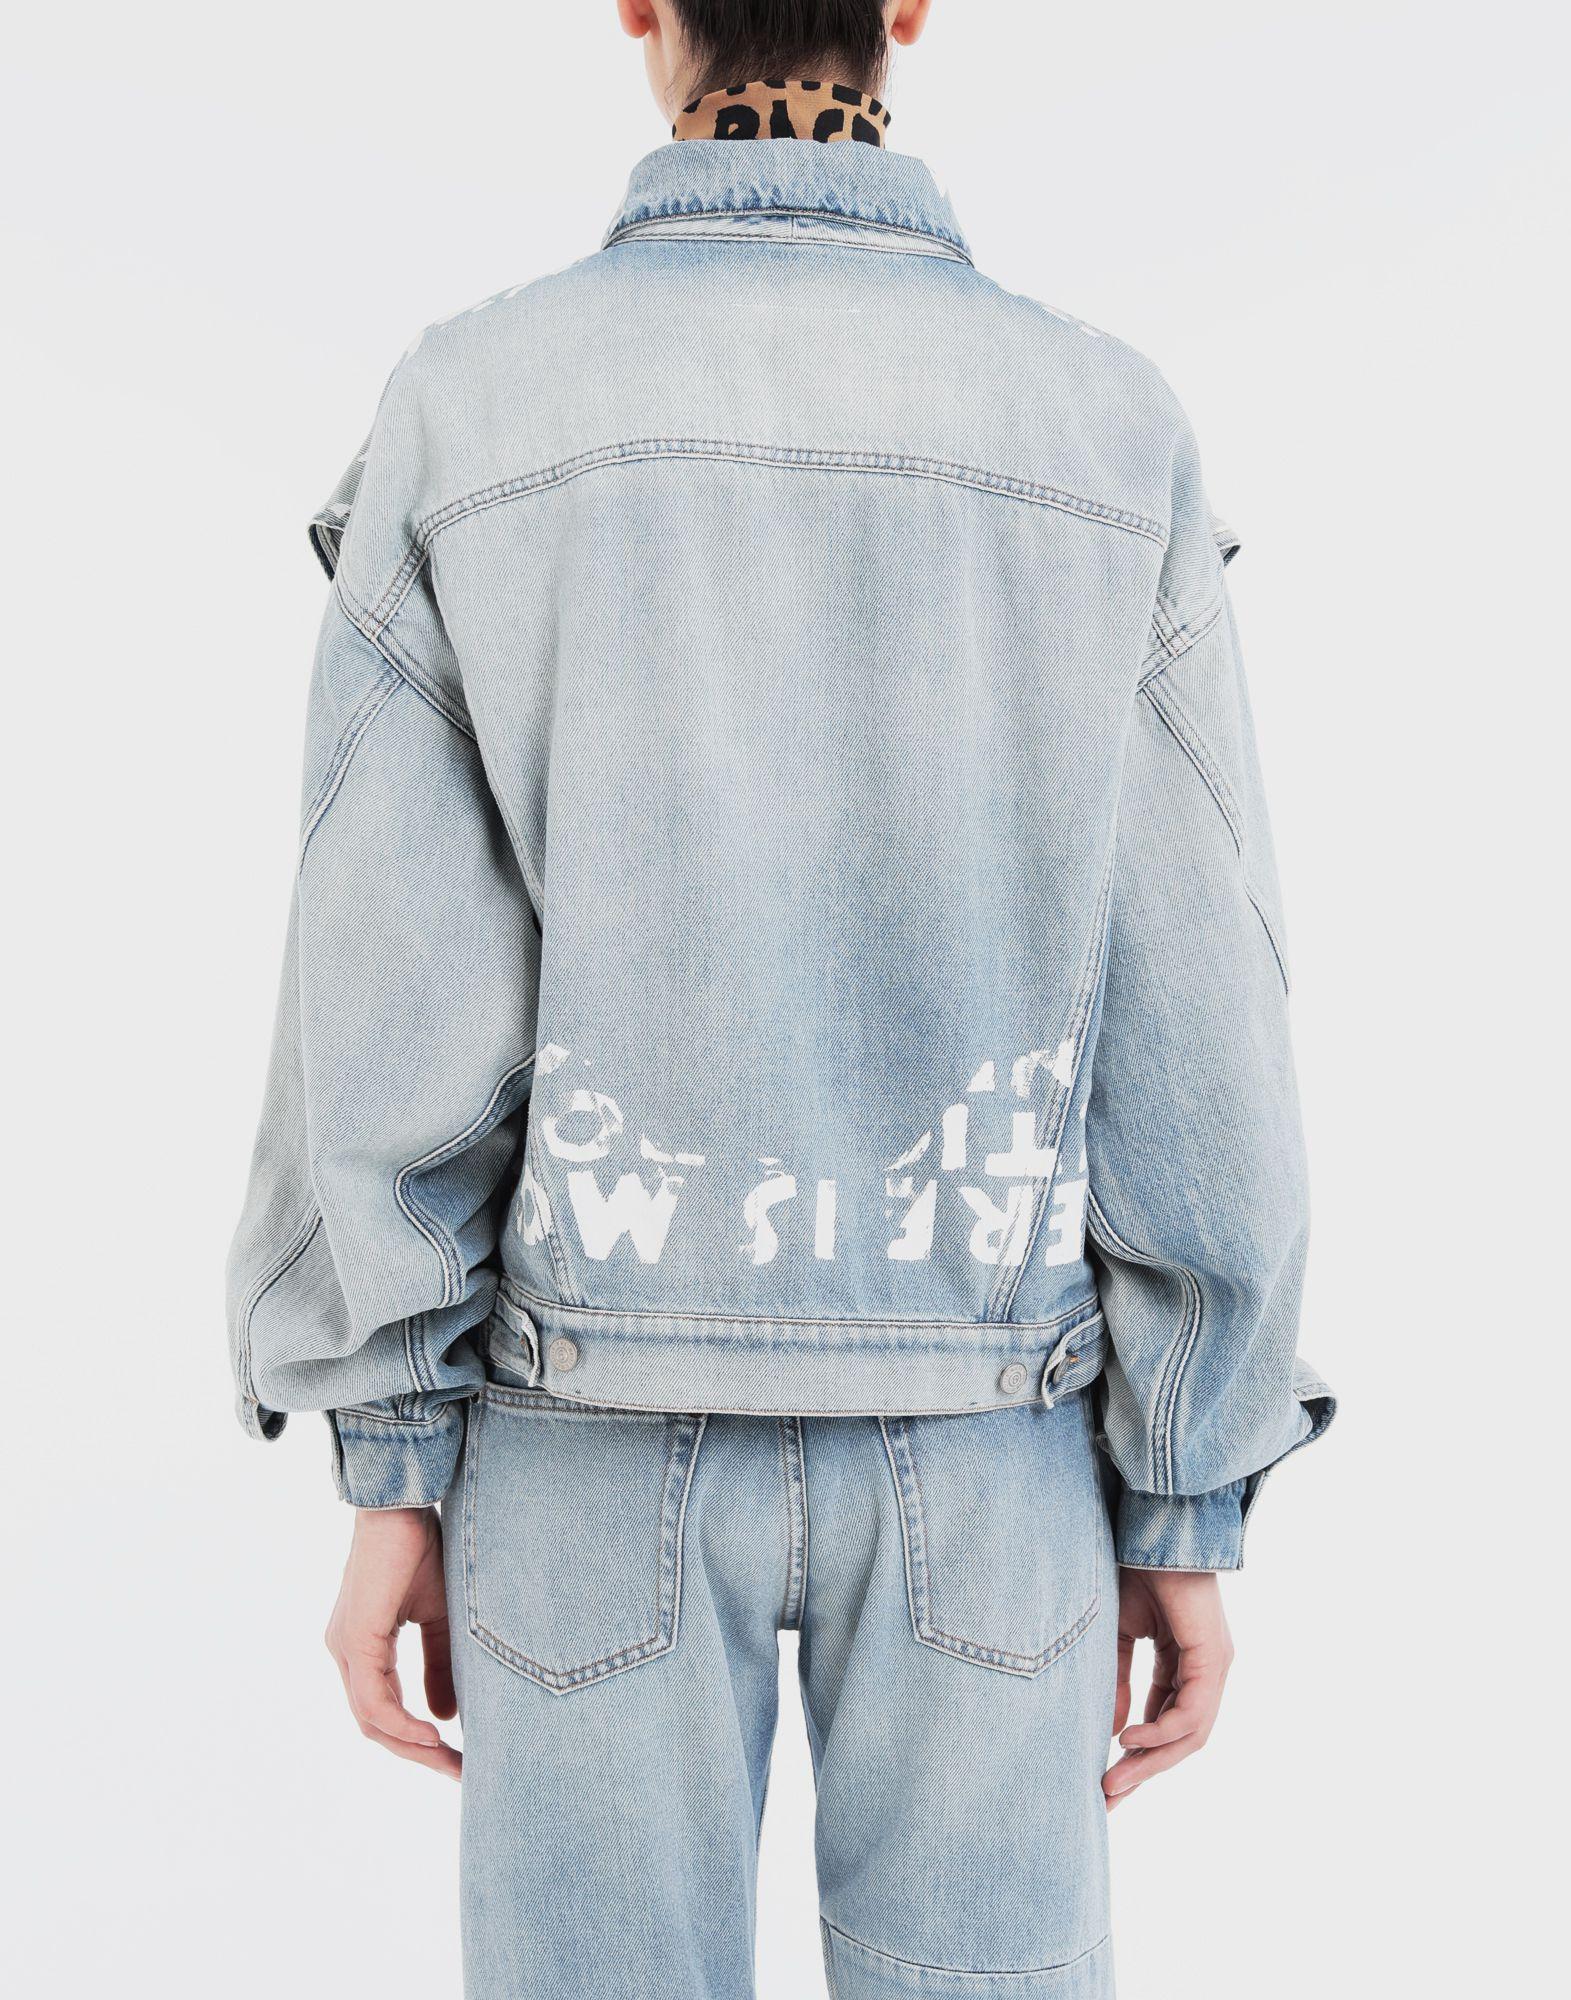 MM6 MAISON MARGIELA Charity AIDS-print jacket Light jacket Woman e